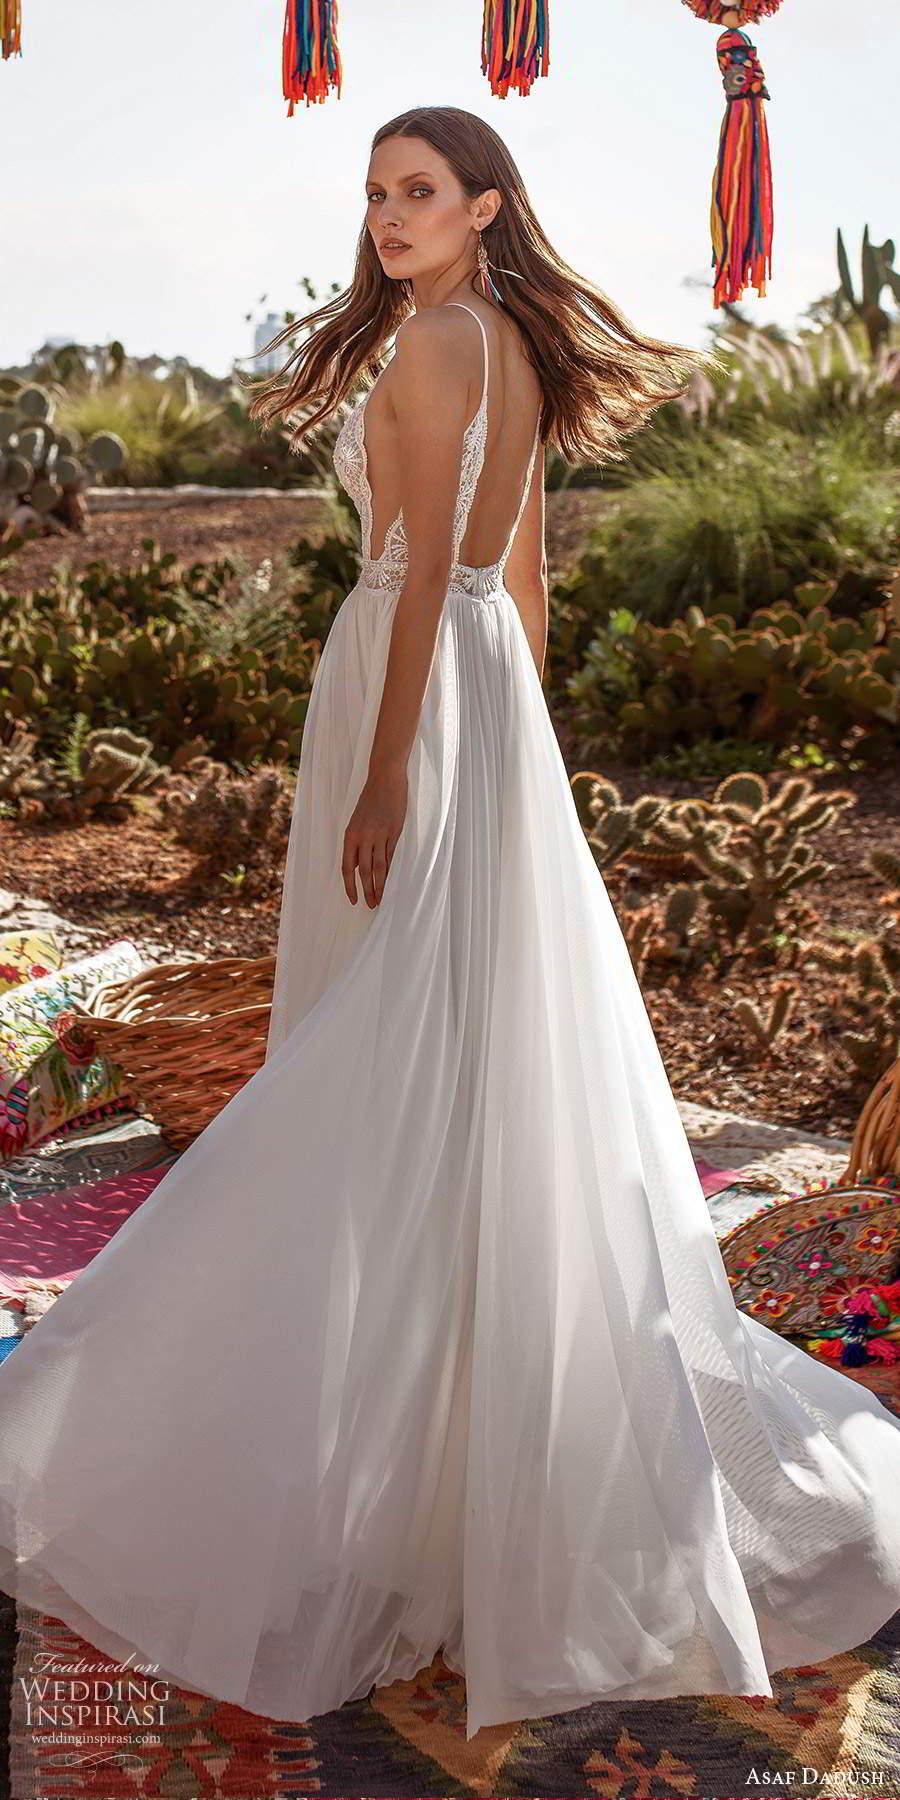 asaf dadush 2020 bridal sleeveless thin straps sweetheart neckline embellished lace bodice a line wedding dress open back (8) bv